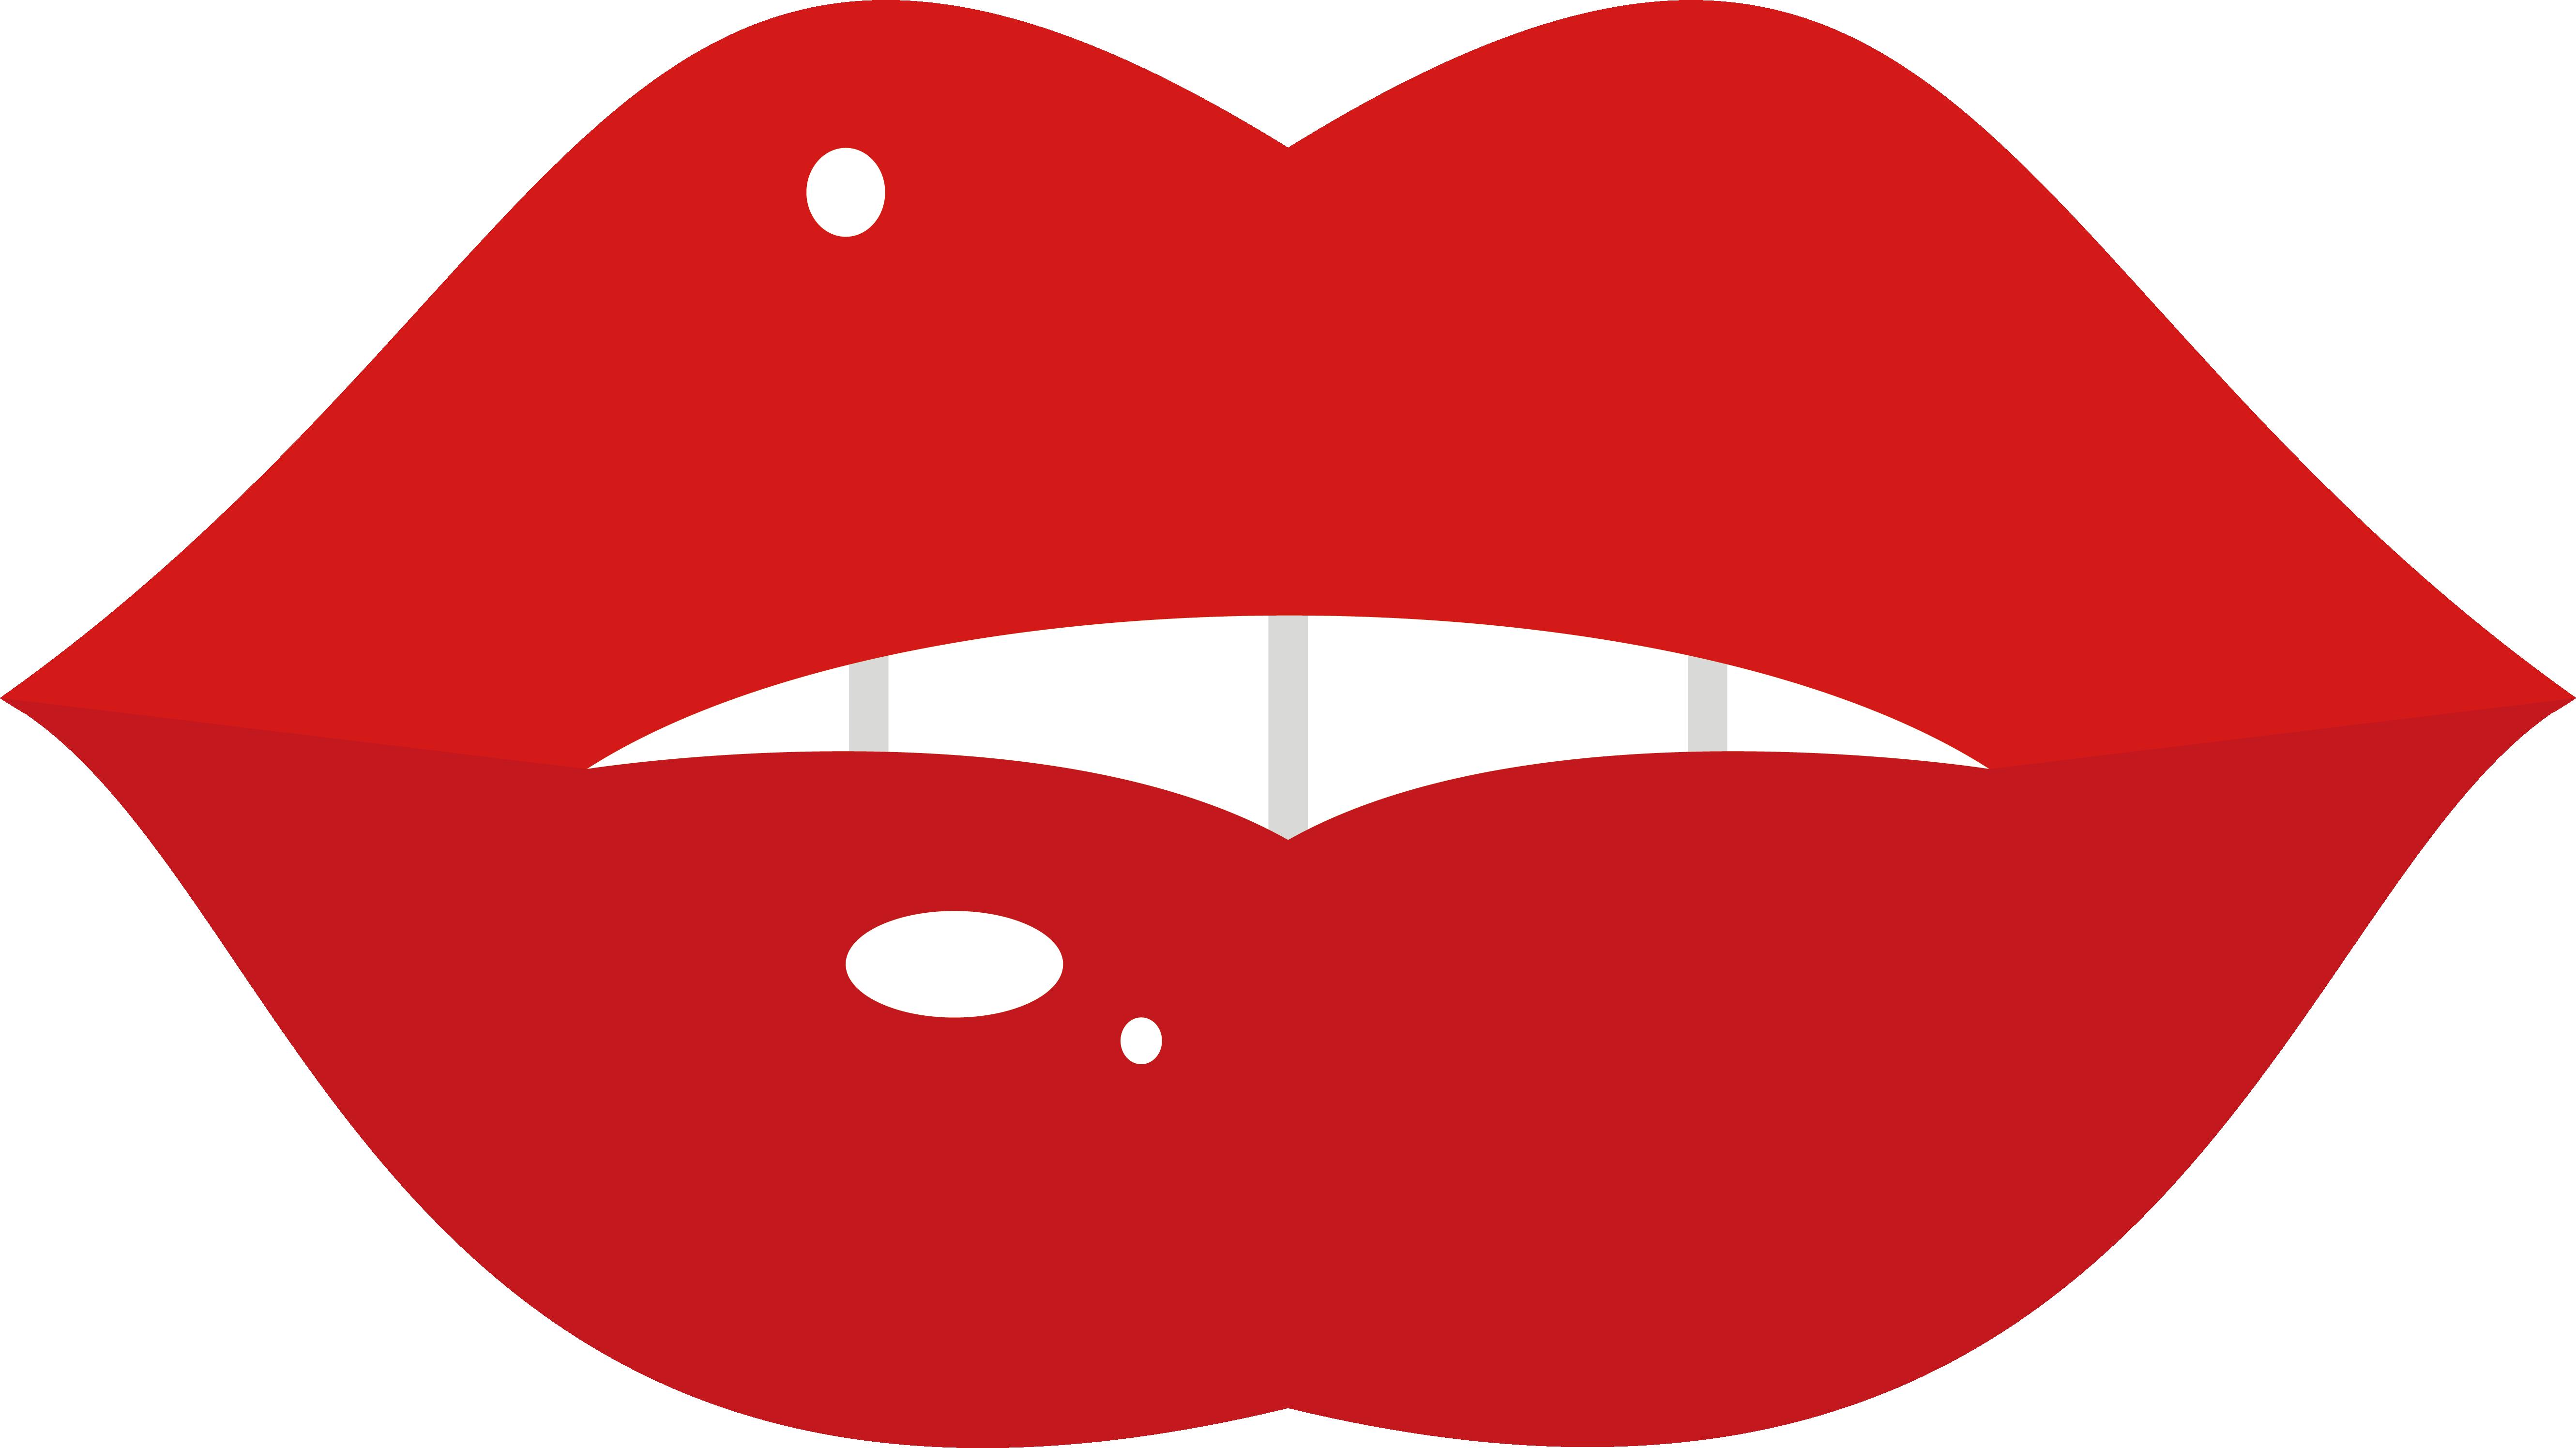 Clipart smile red lip. Heart clip art sexy